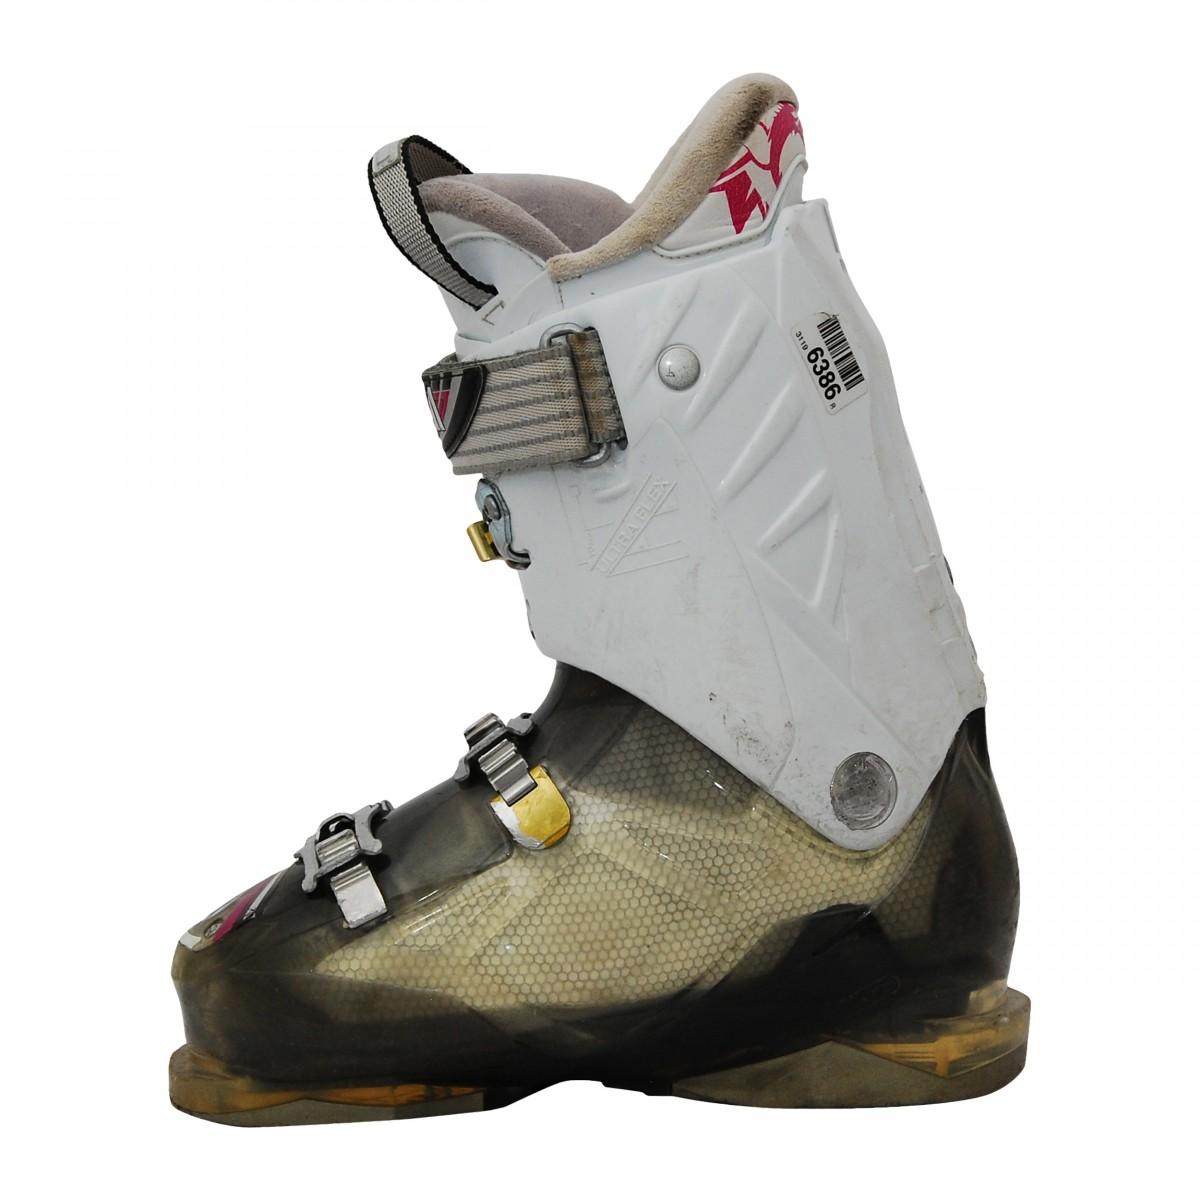 chaussure ski tecnica dragon 100